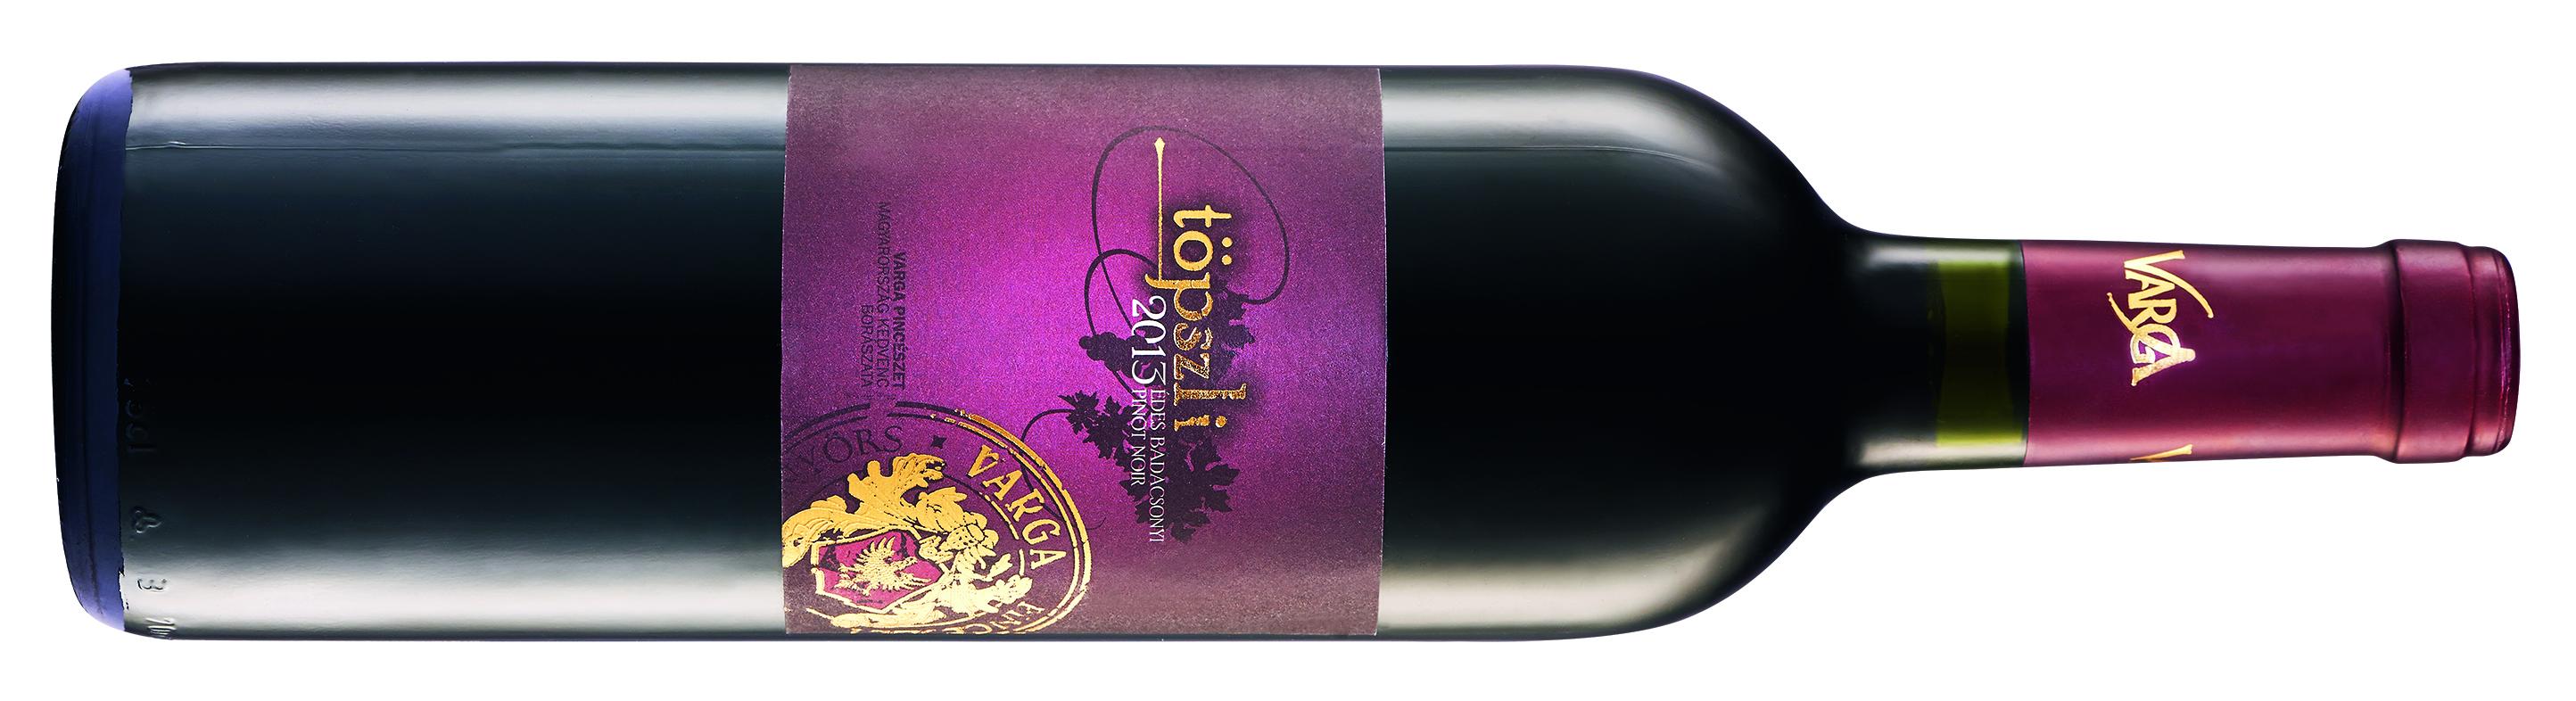 Varga Balatoni Pinot Noir sweet Töpszli 2013